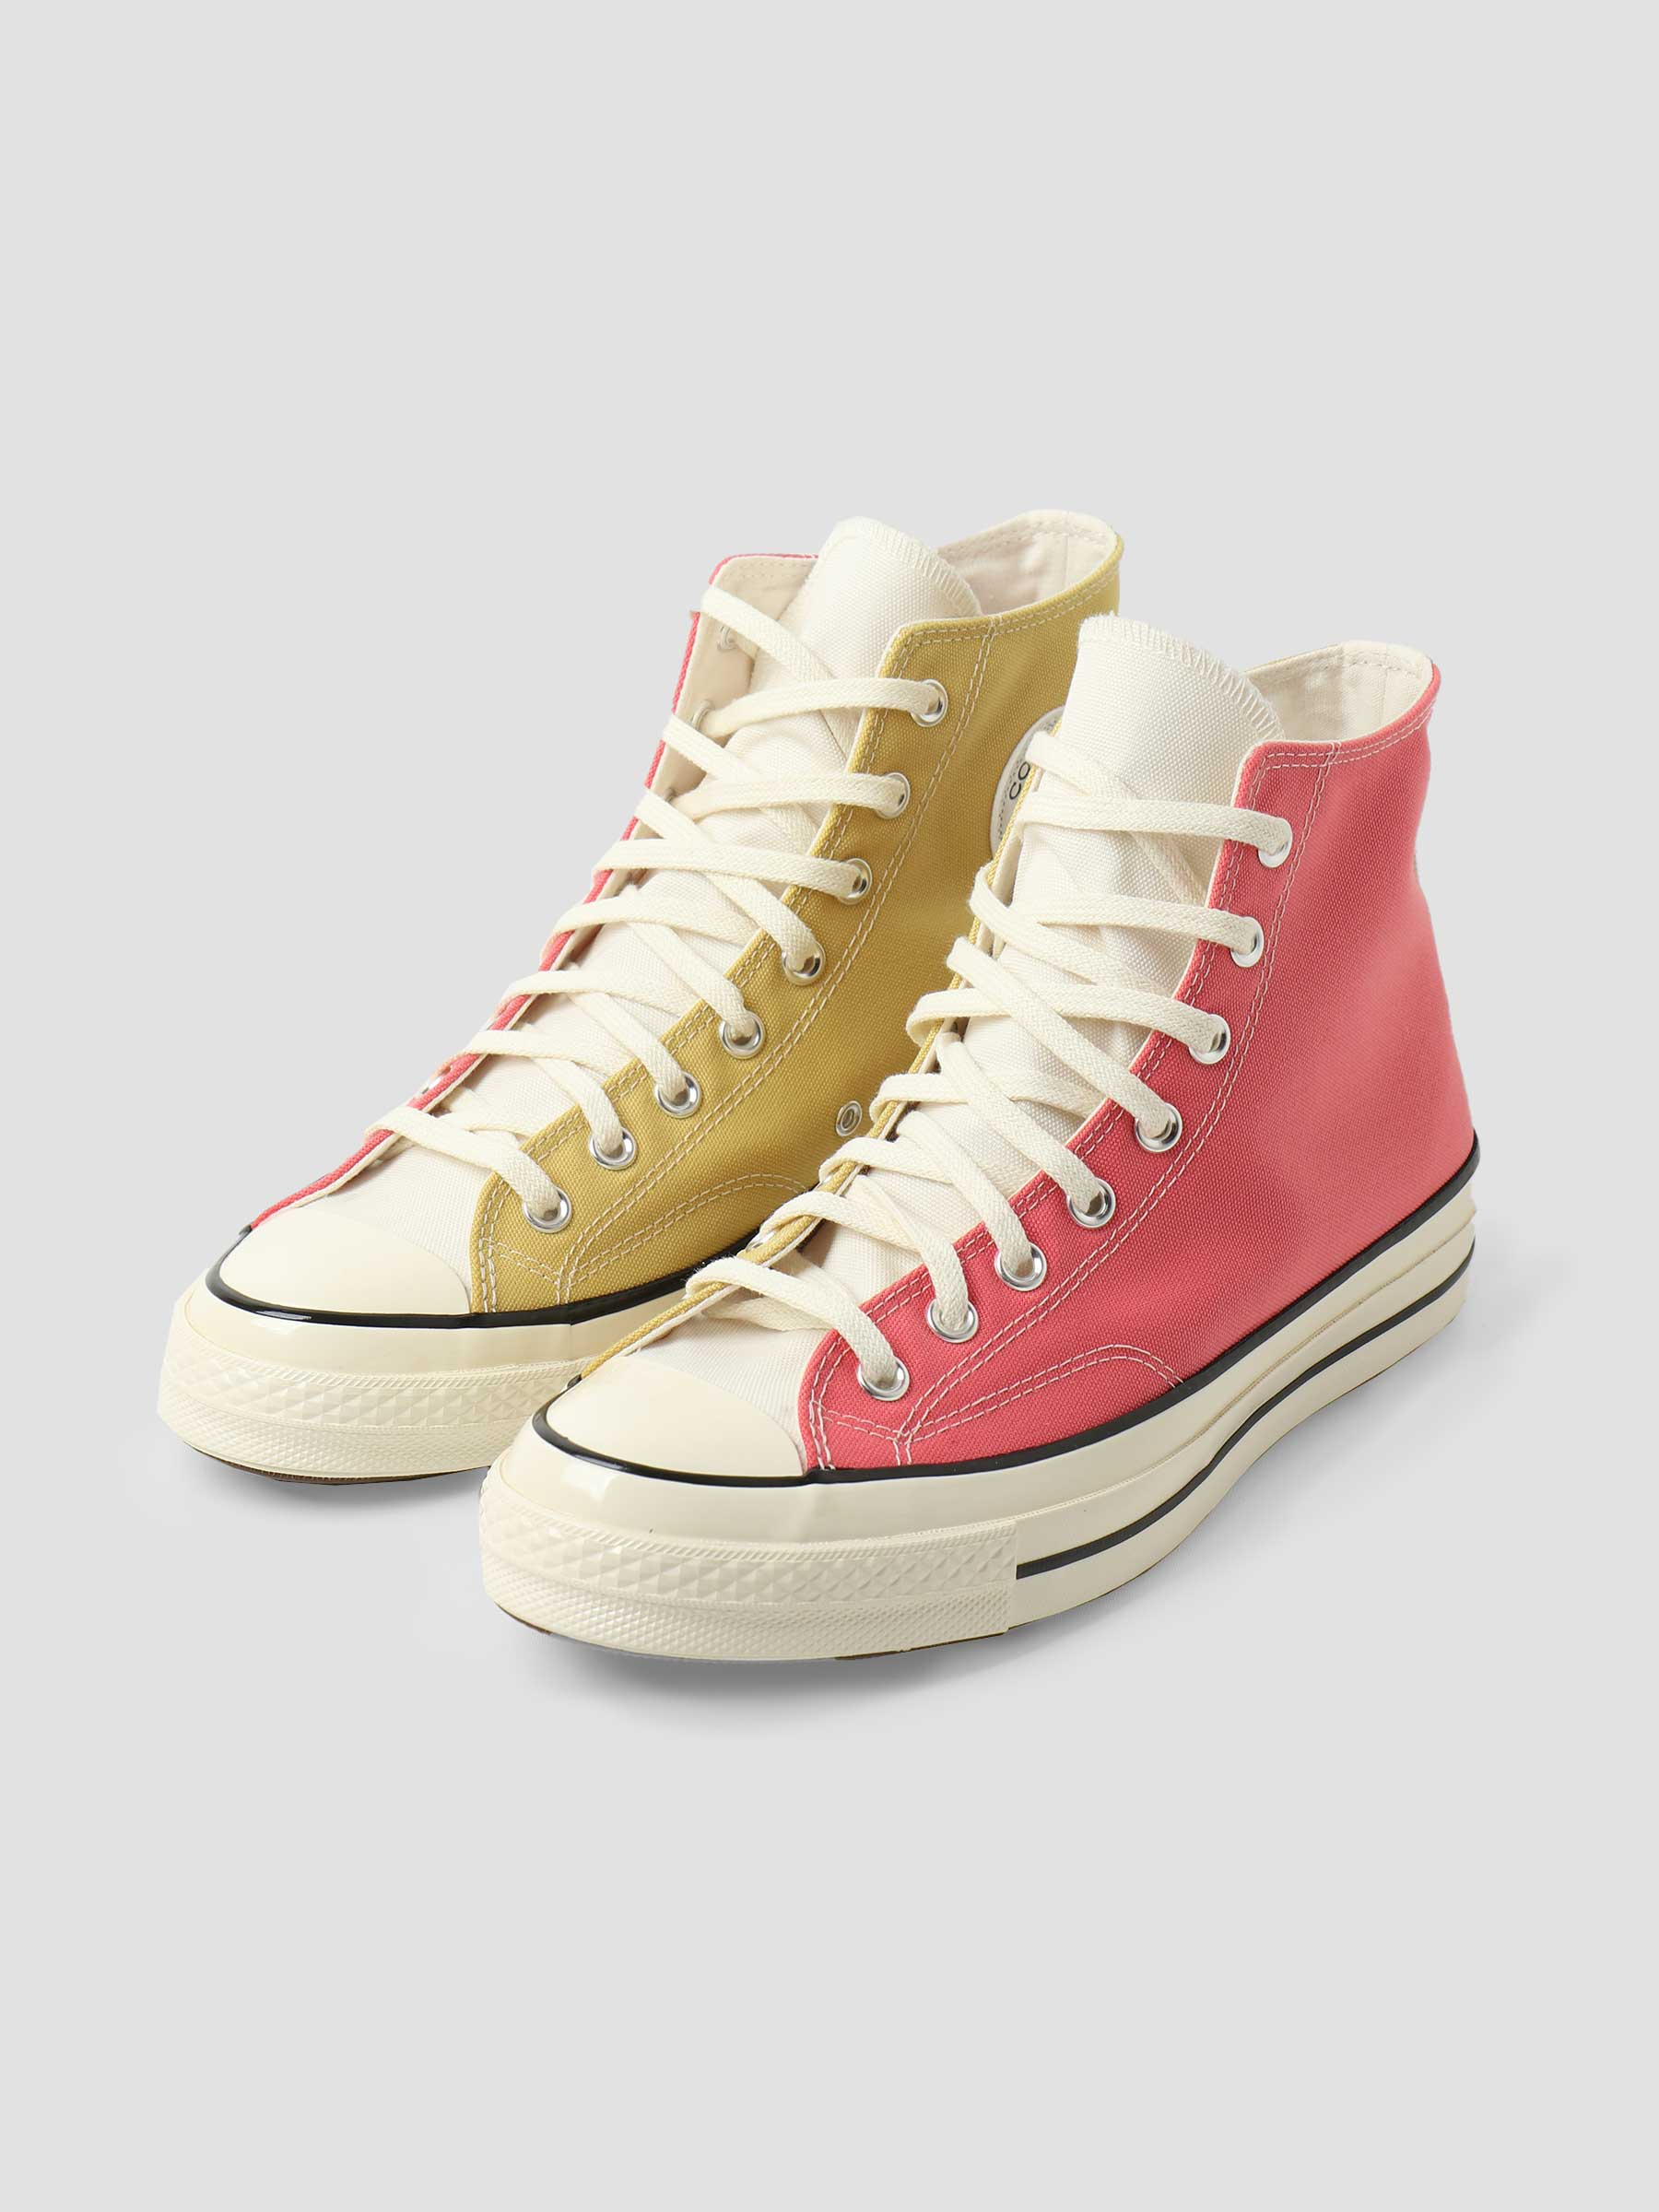 Chuck 70 HI Saturn Gold Pink Salt Egret 171660C